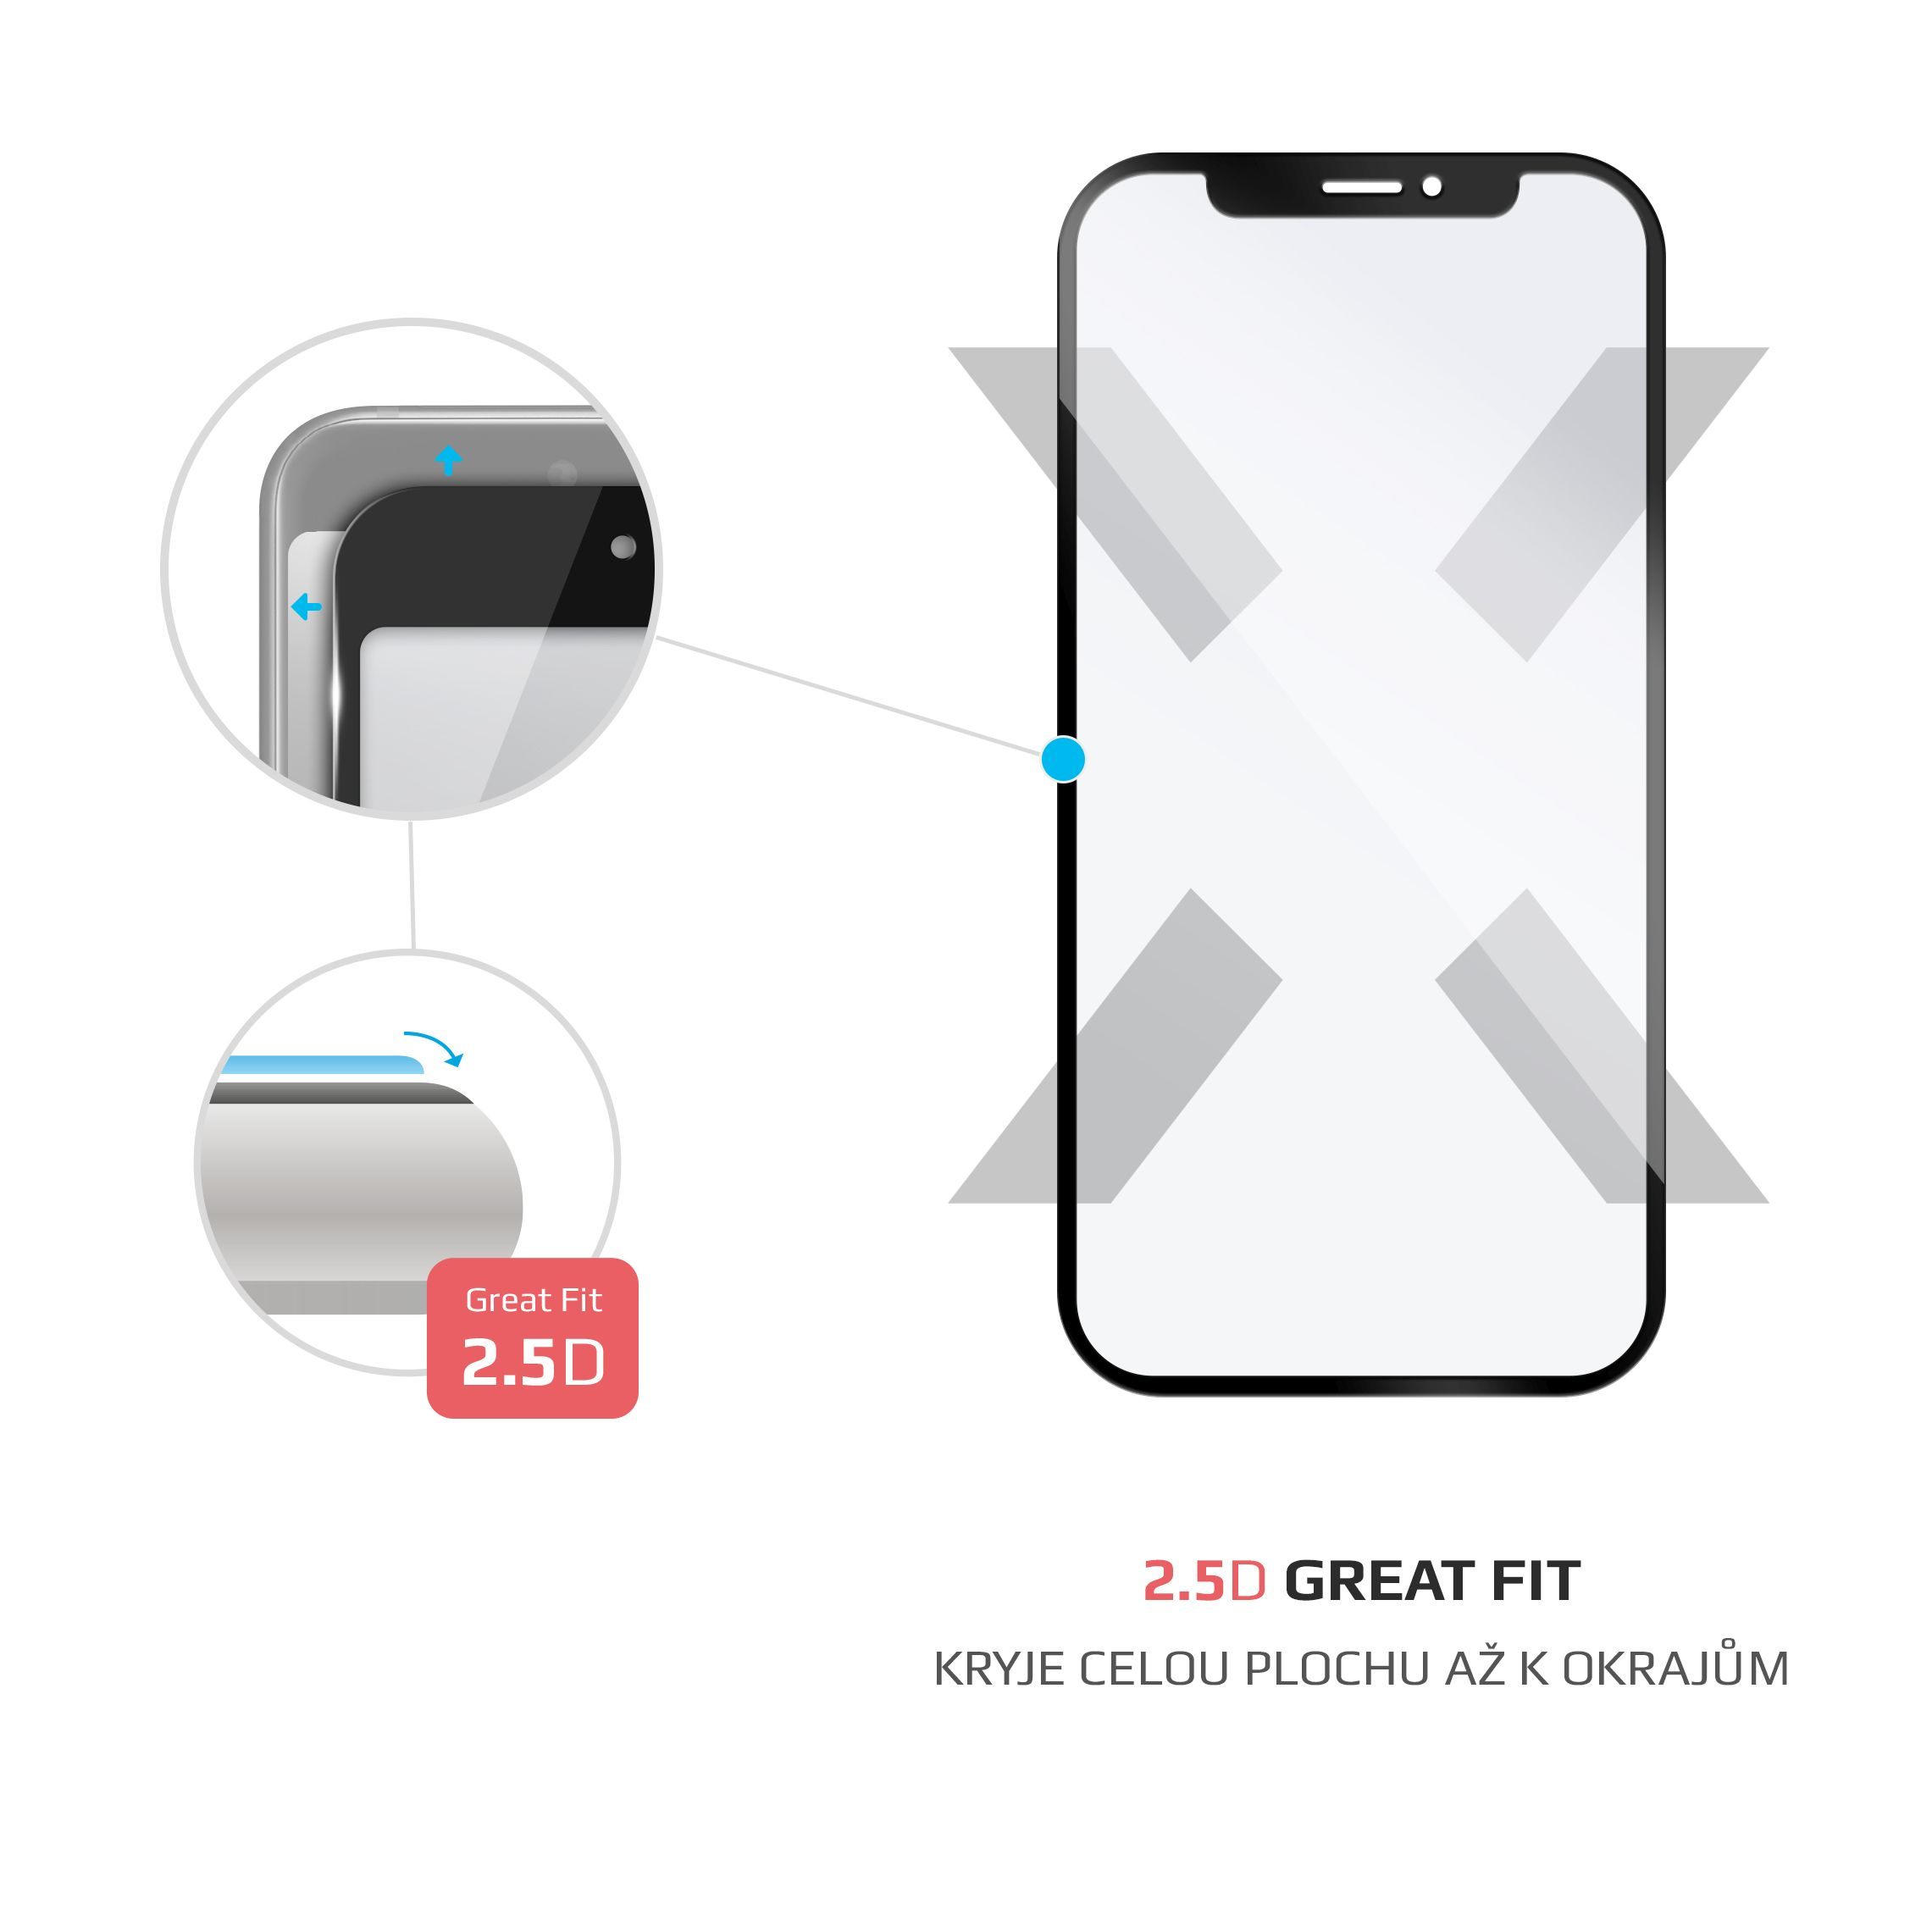 Ochranné tvrzené sklo FIXED Full-Cover pro Huawei Y6 (2019), přes celý displej, černé